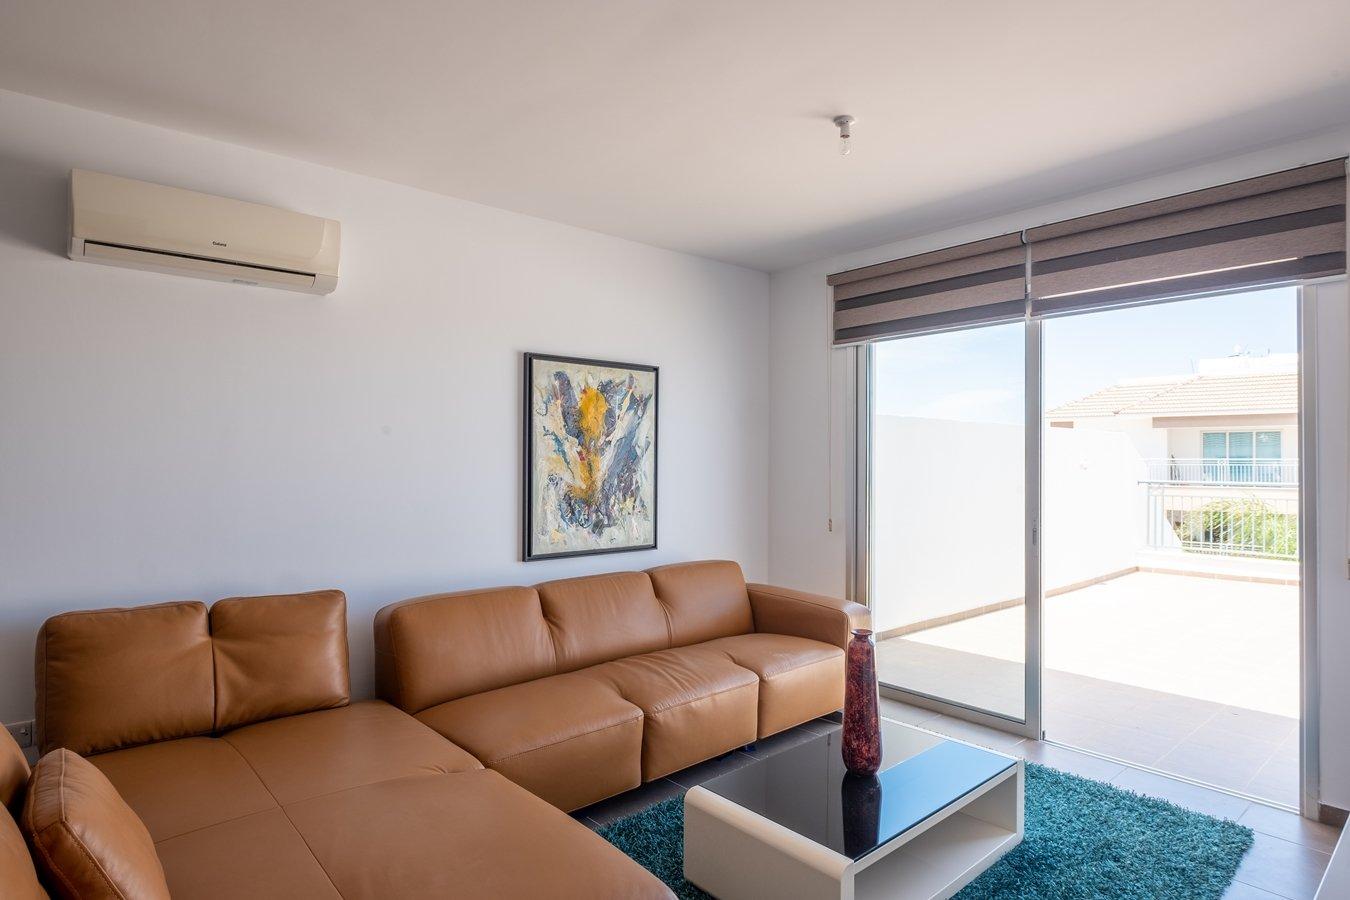 Chara-Kypria-Apartments-204-DSCF0513-HDR